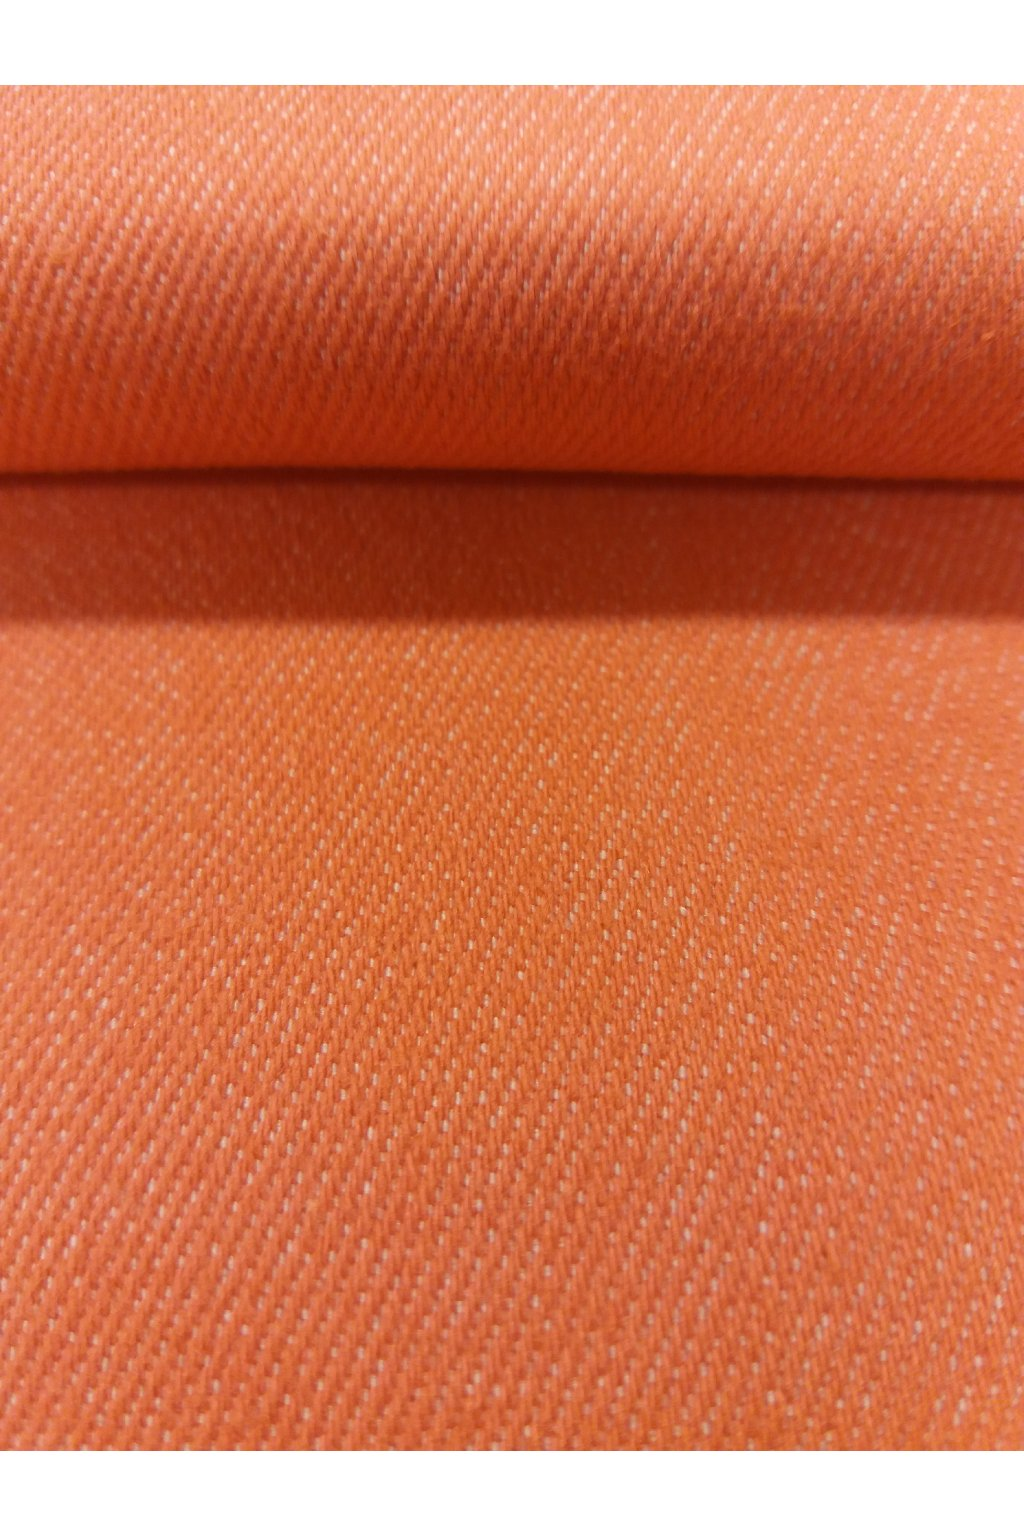 Riflovina jeans orange